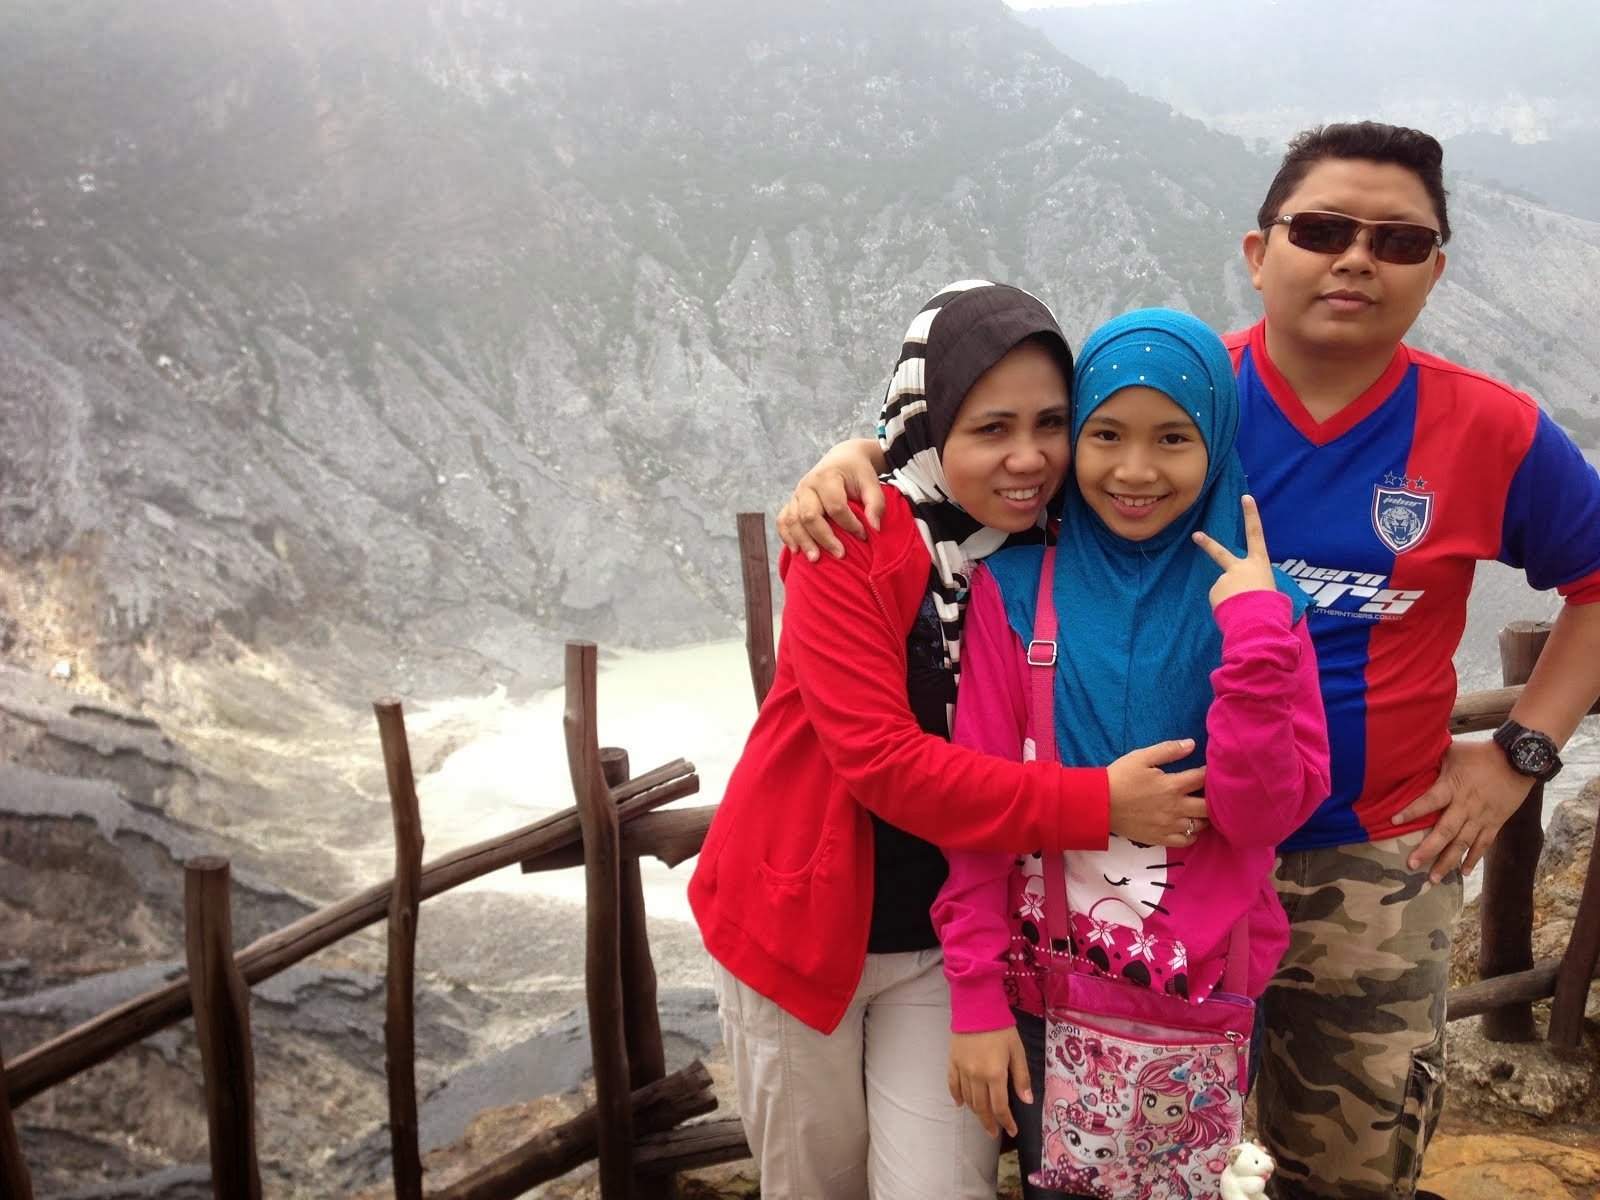 Bandung, Feb 2014